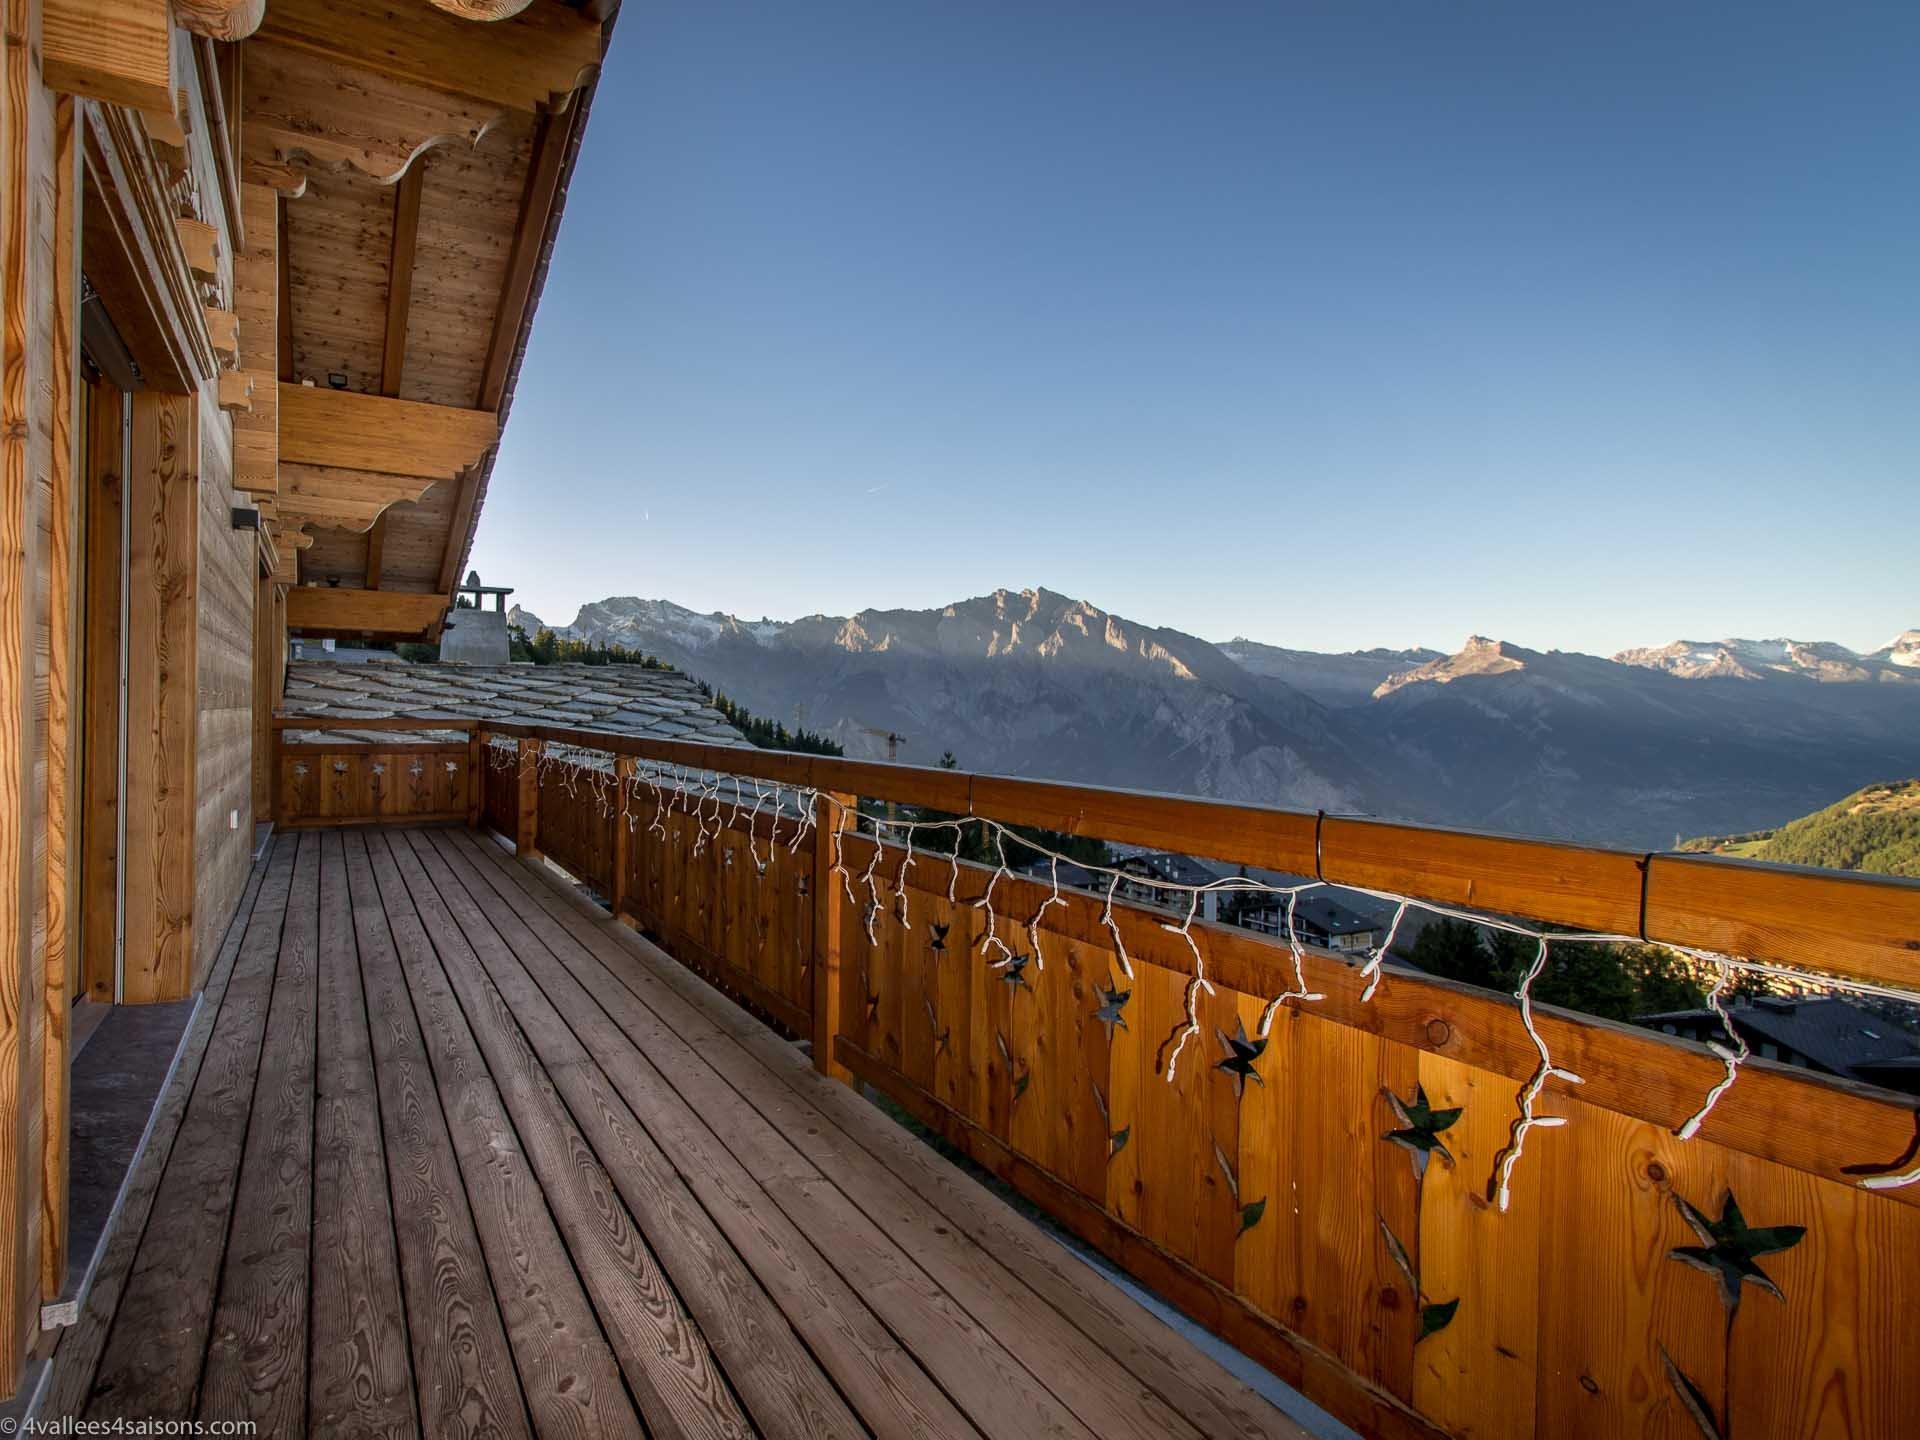 Luxury Penthouse Ski-in Ski-out Accommodation in Verbier St-Bernard